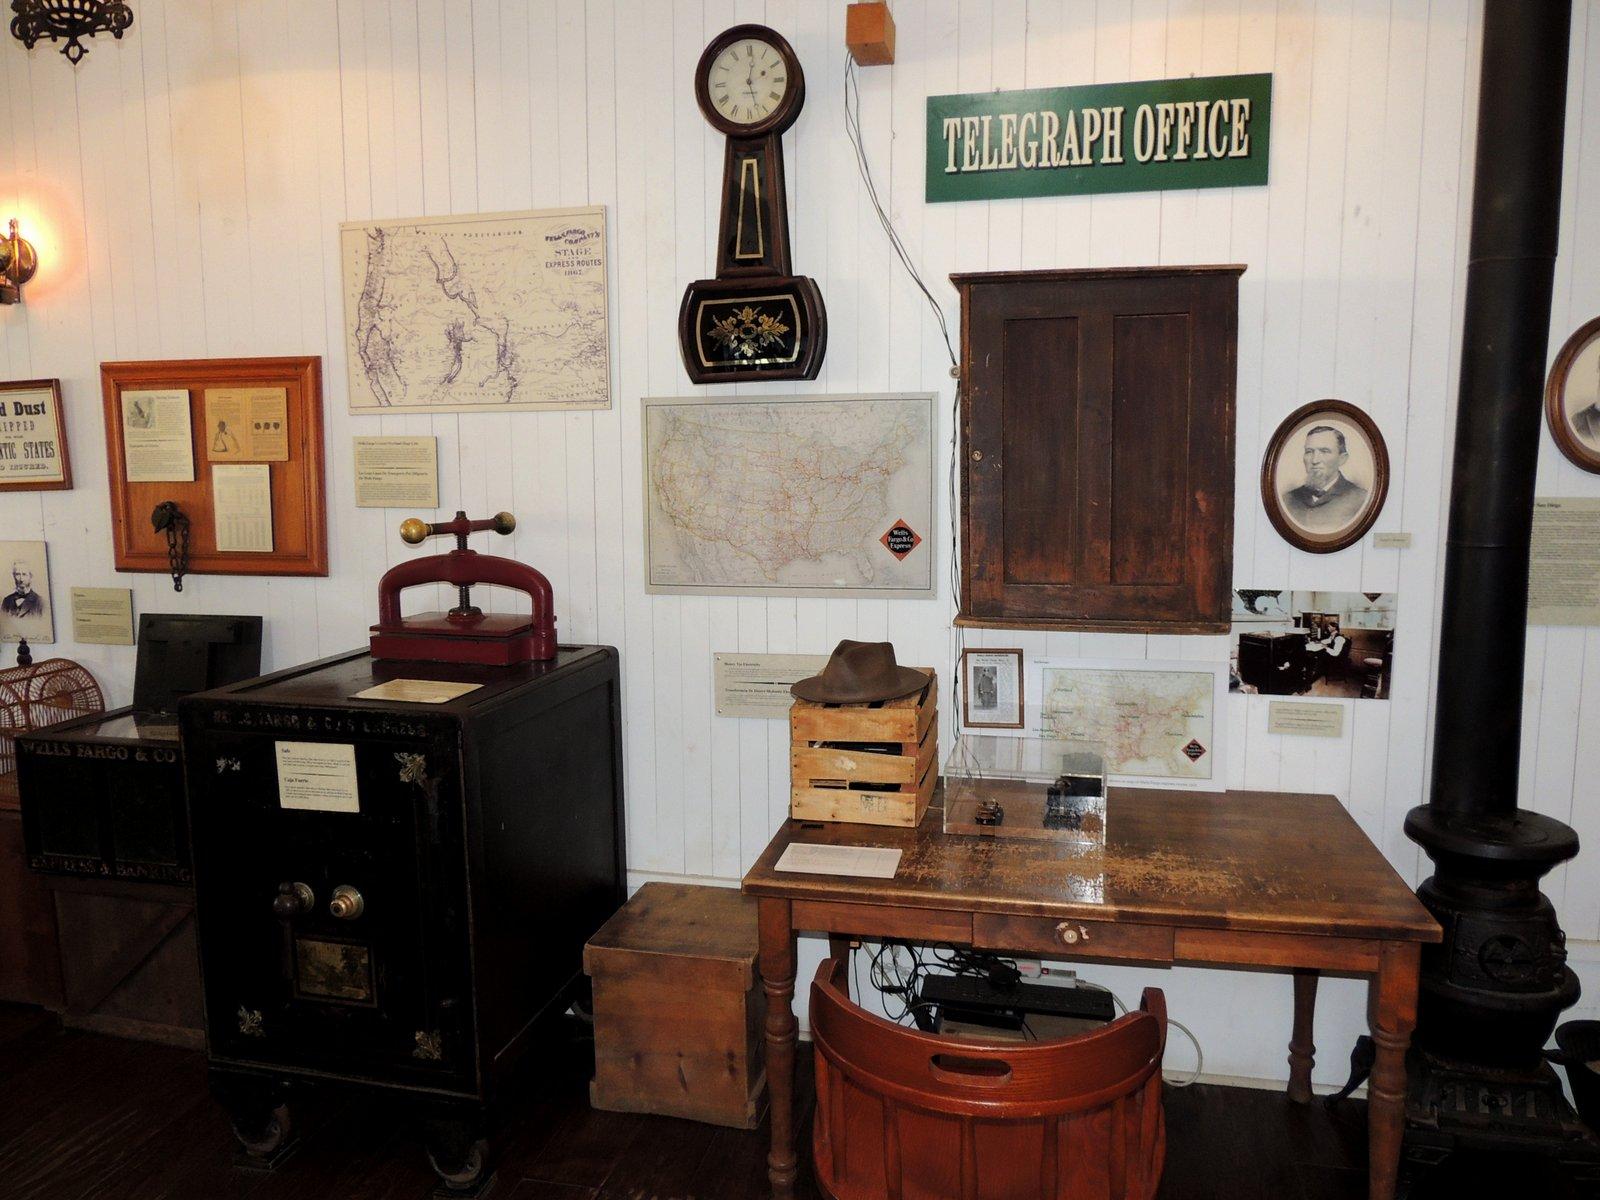 Wells Fargo Office in Old Town San Diego